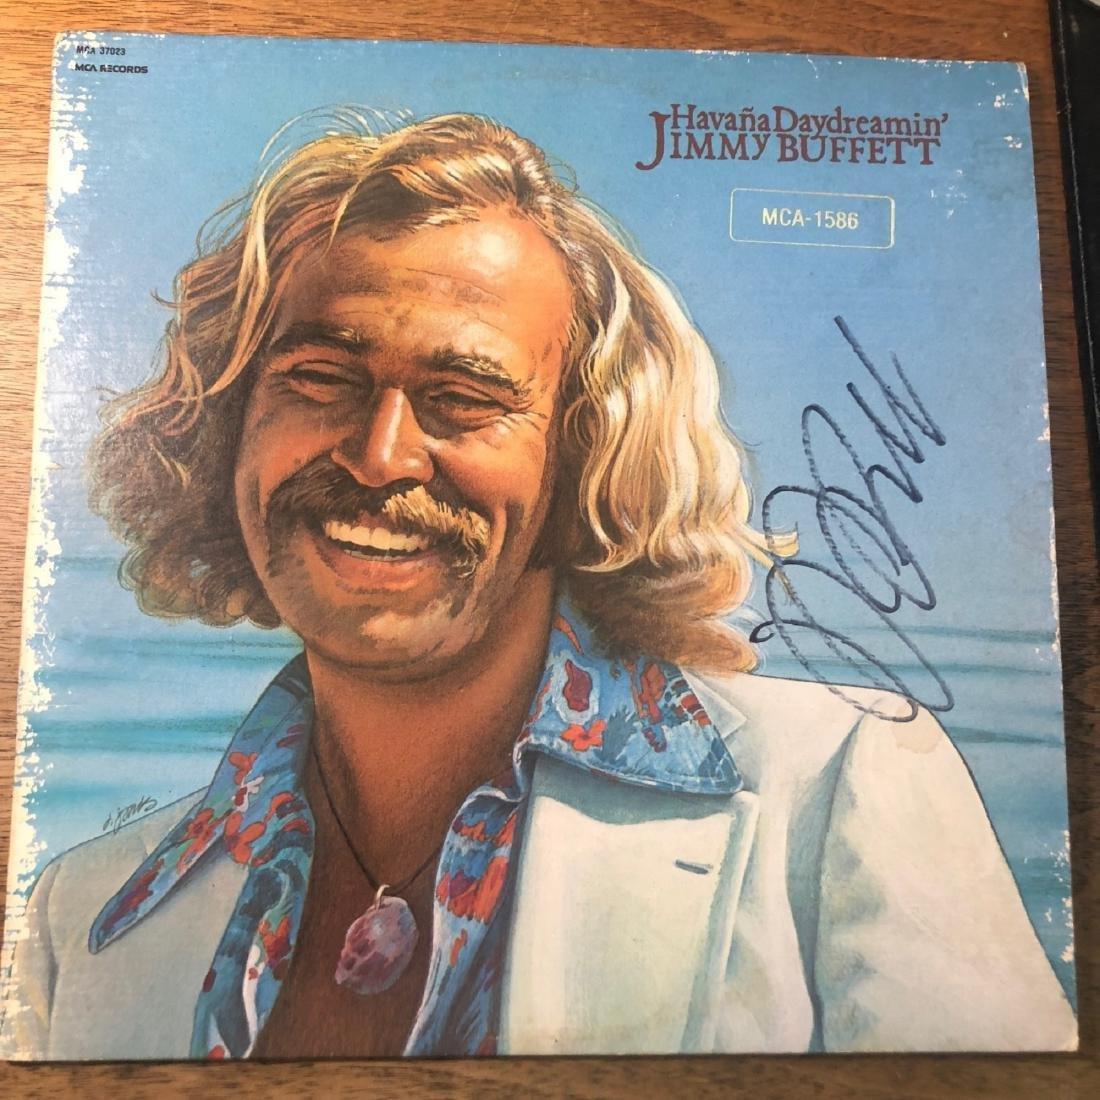 Signed Jimmy Buffet Havana Daydreaming Album